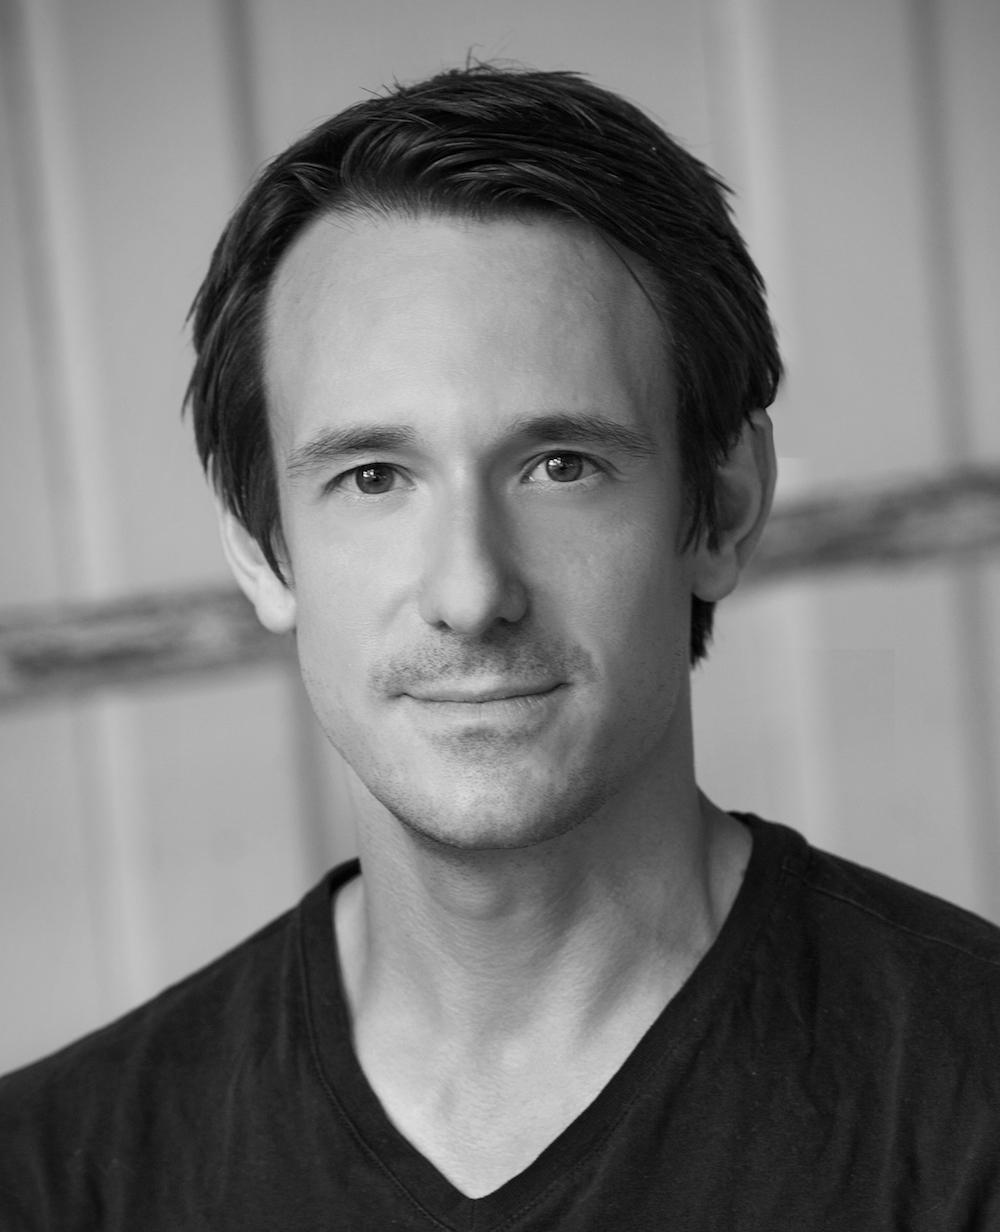 James Sofranko, choreographer